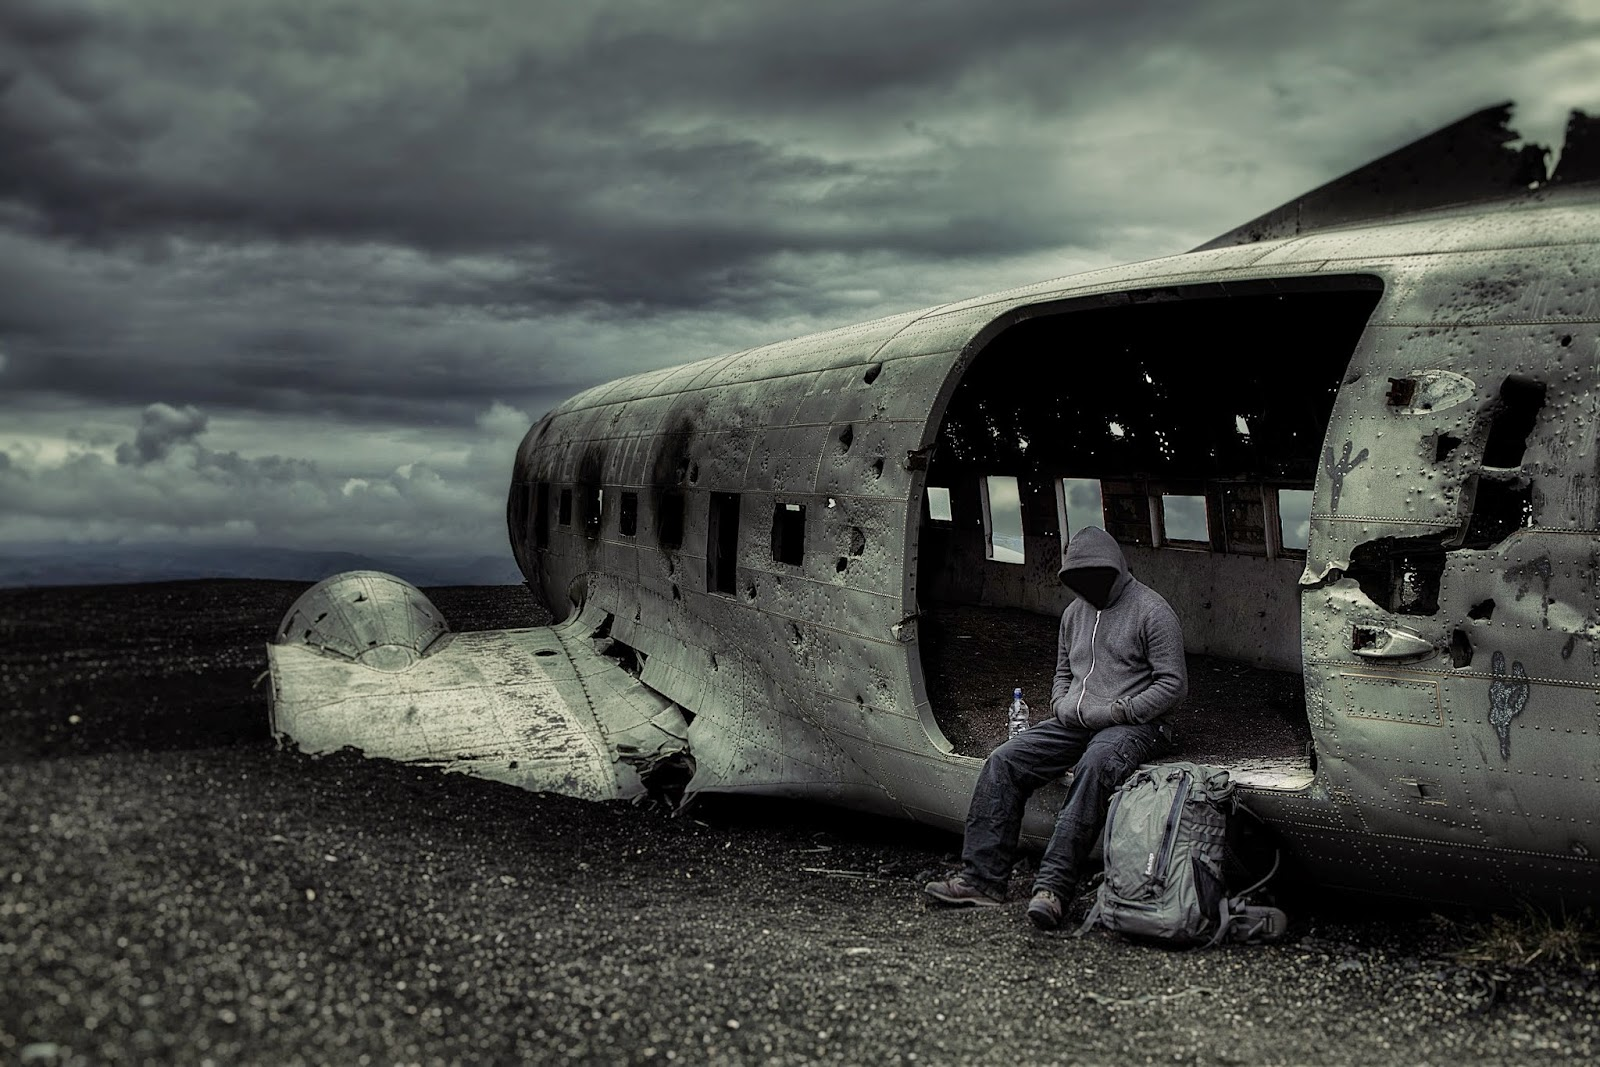 Mike Murphy, fotografía HDR